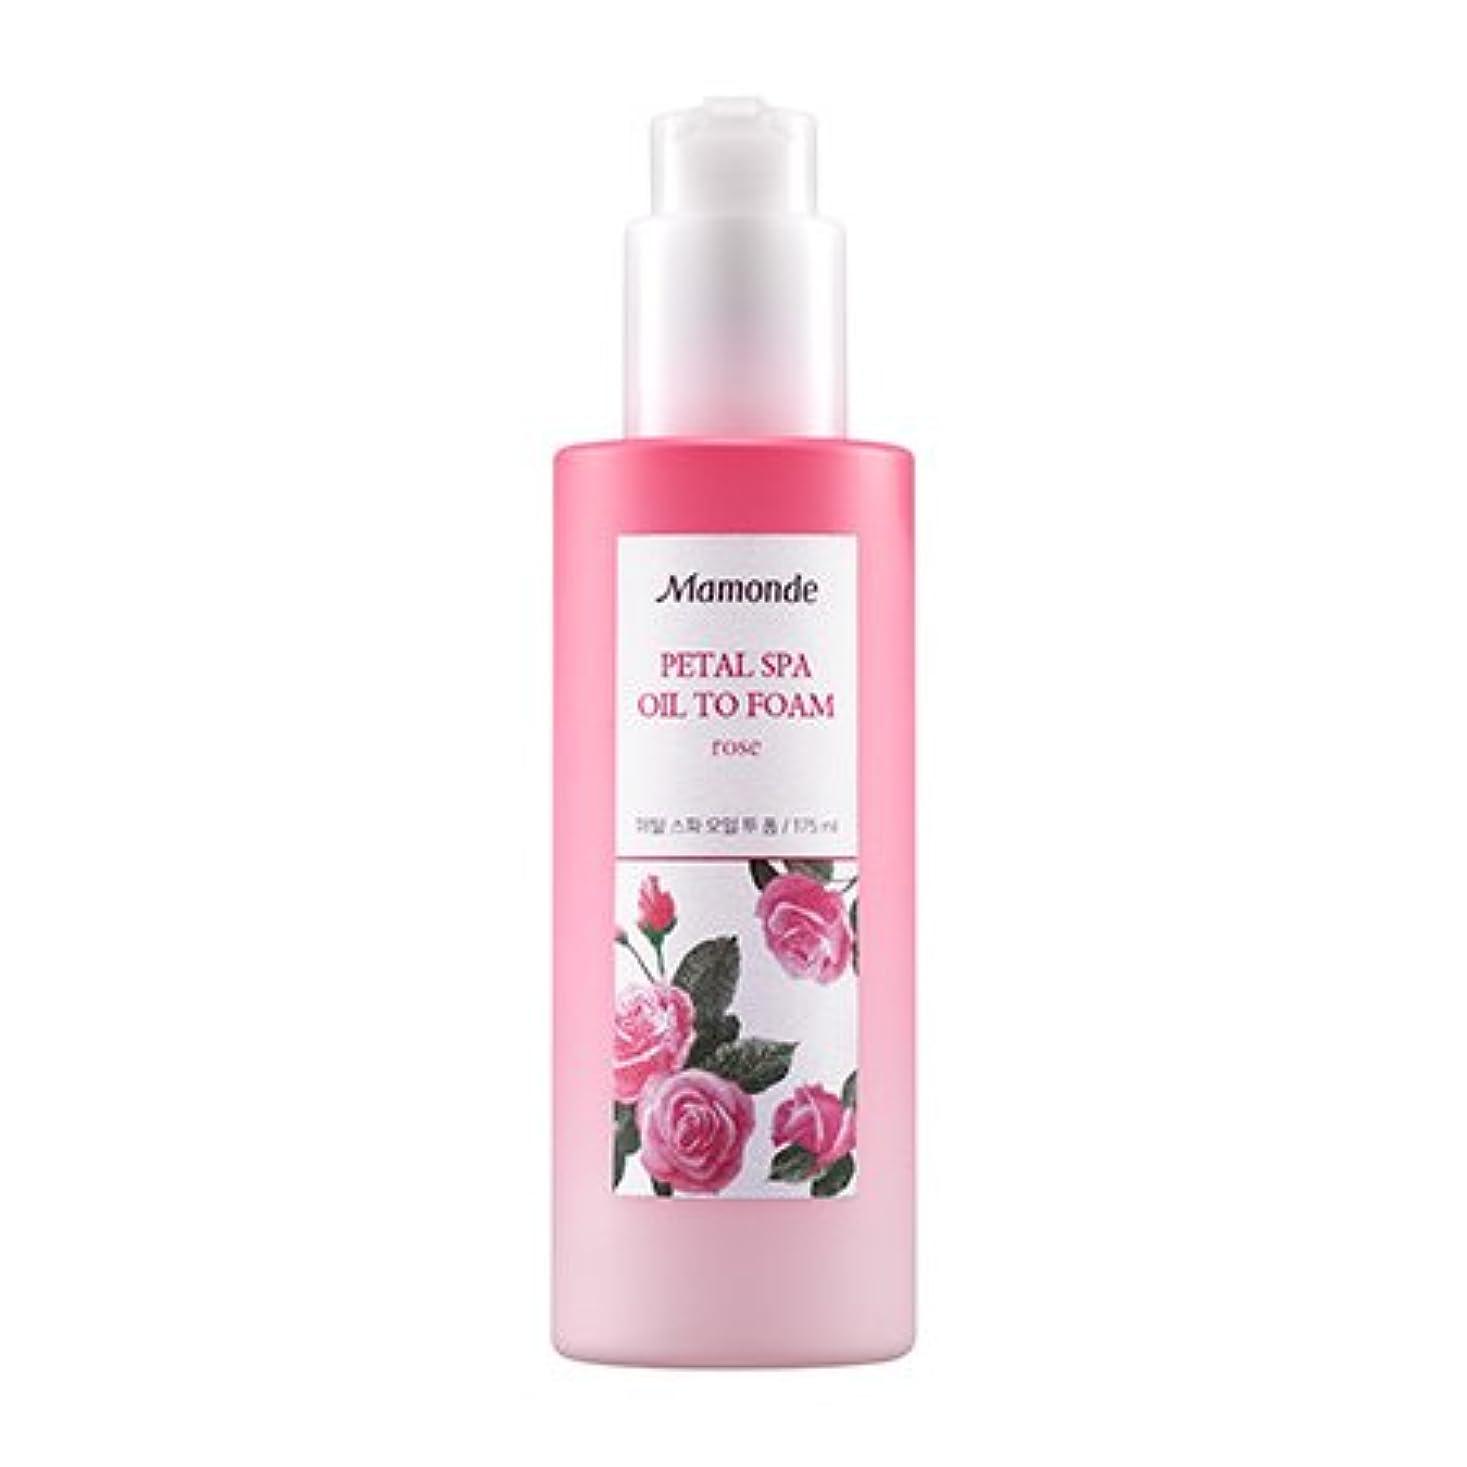 [New] Mamonde Petal Spa Oil to Foam 175ml/マモンド ペタル スパ オイル トゥ フォーム 175ml [並行輸入品]